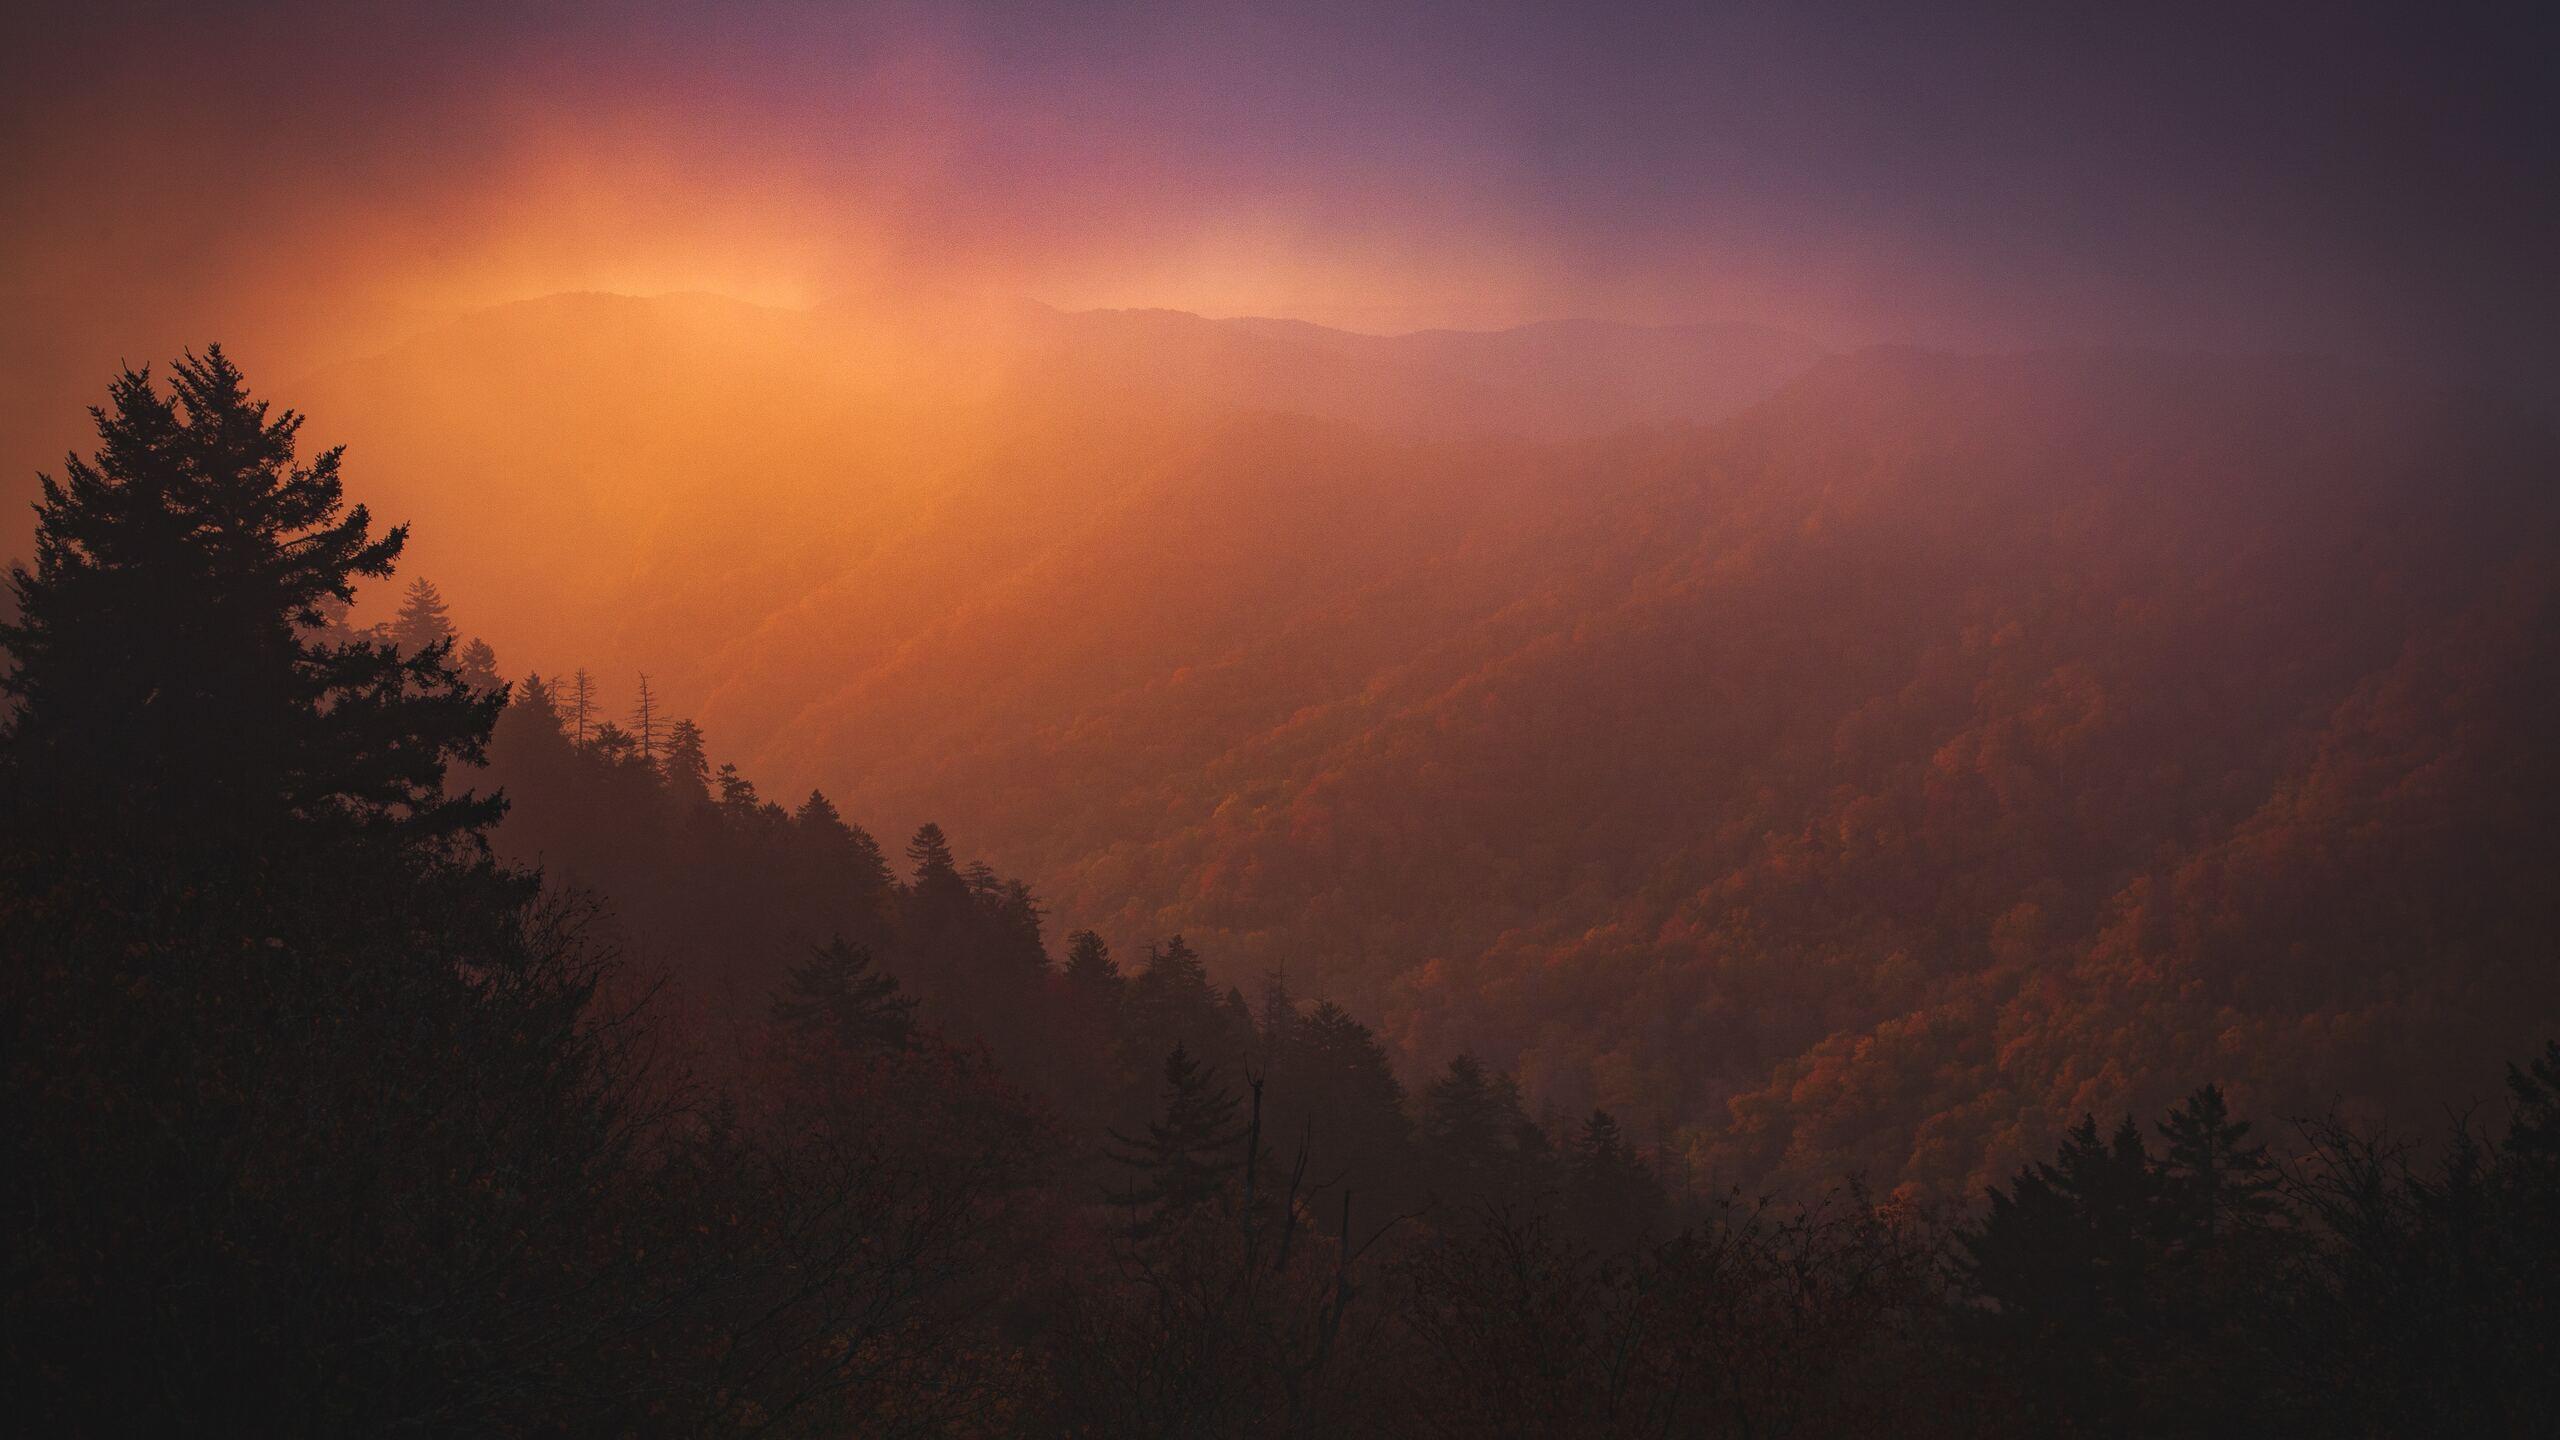 dawn-overy-smoky-mountains-4k-1e.jpg